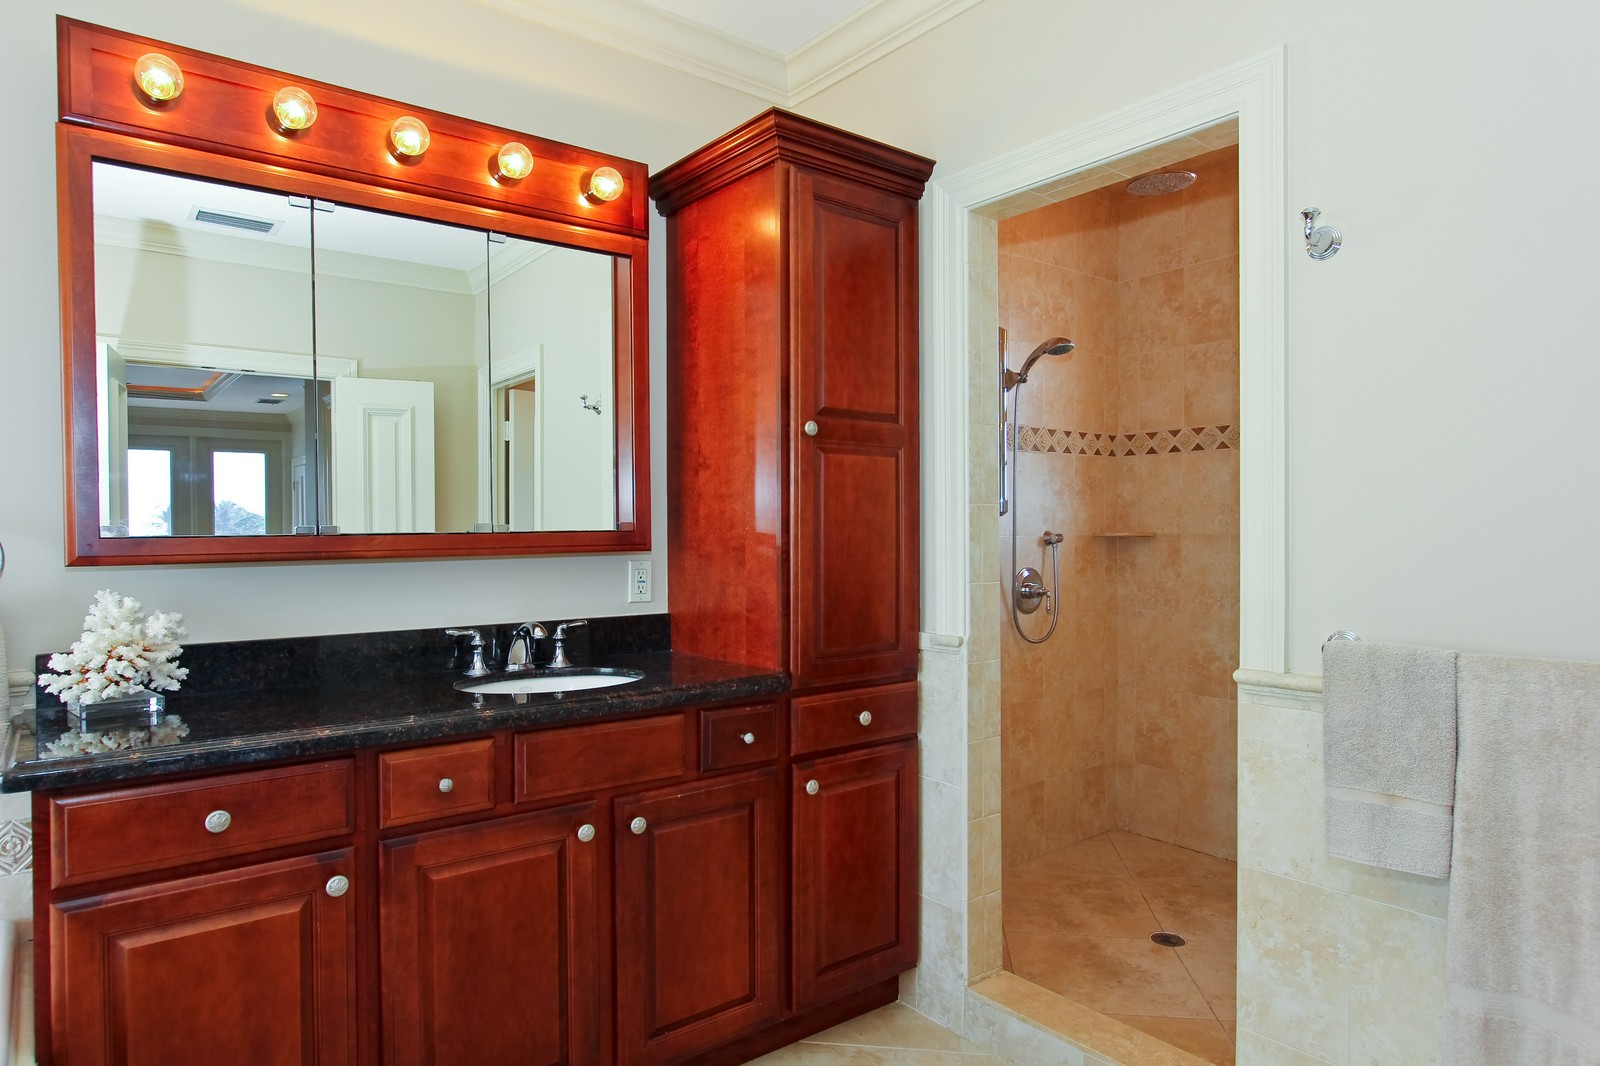 Real Estate Photography - 430 N. Lyra Circle, Juno Beach, FL, 33408 - Master Bedroom